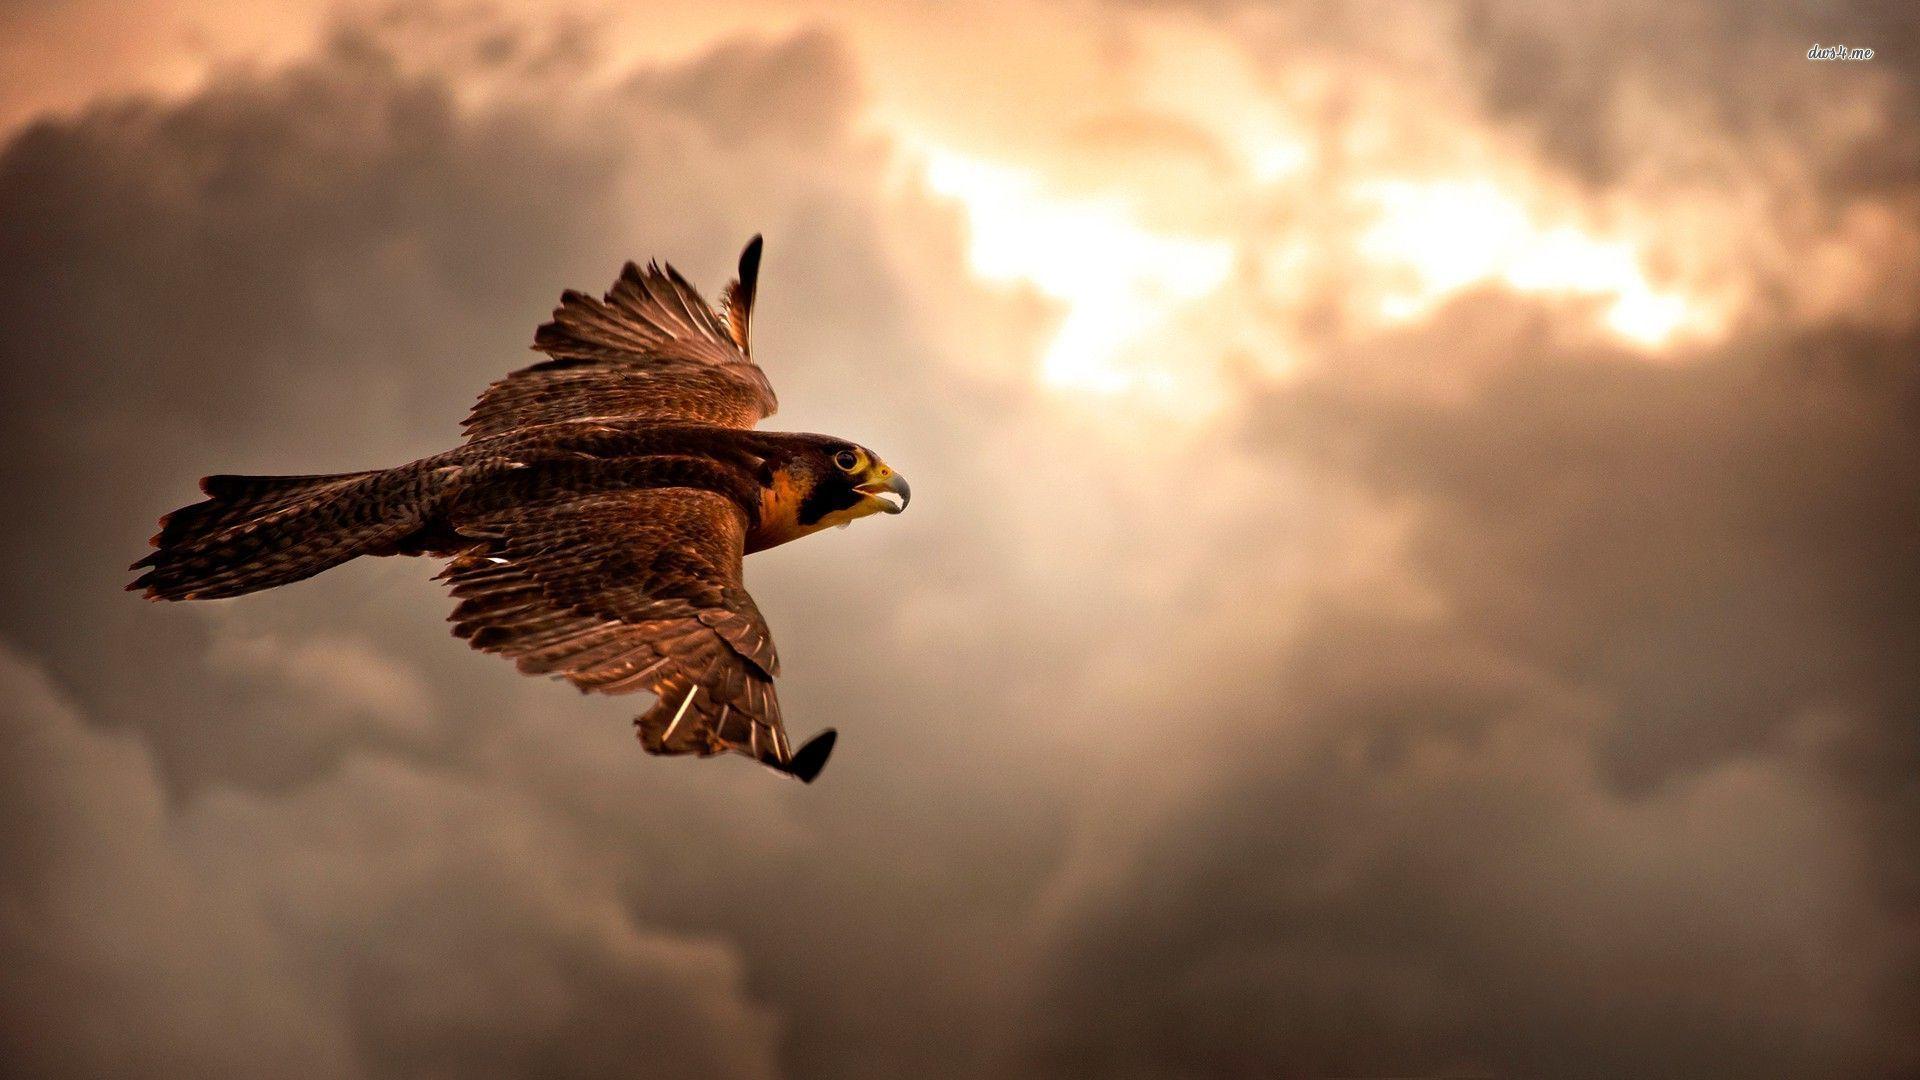 hawk hd wallpaper - photo #23